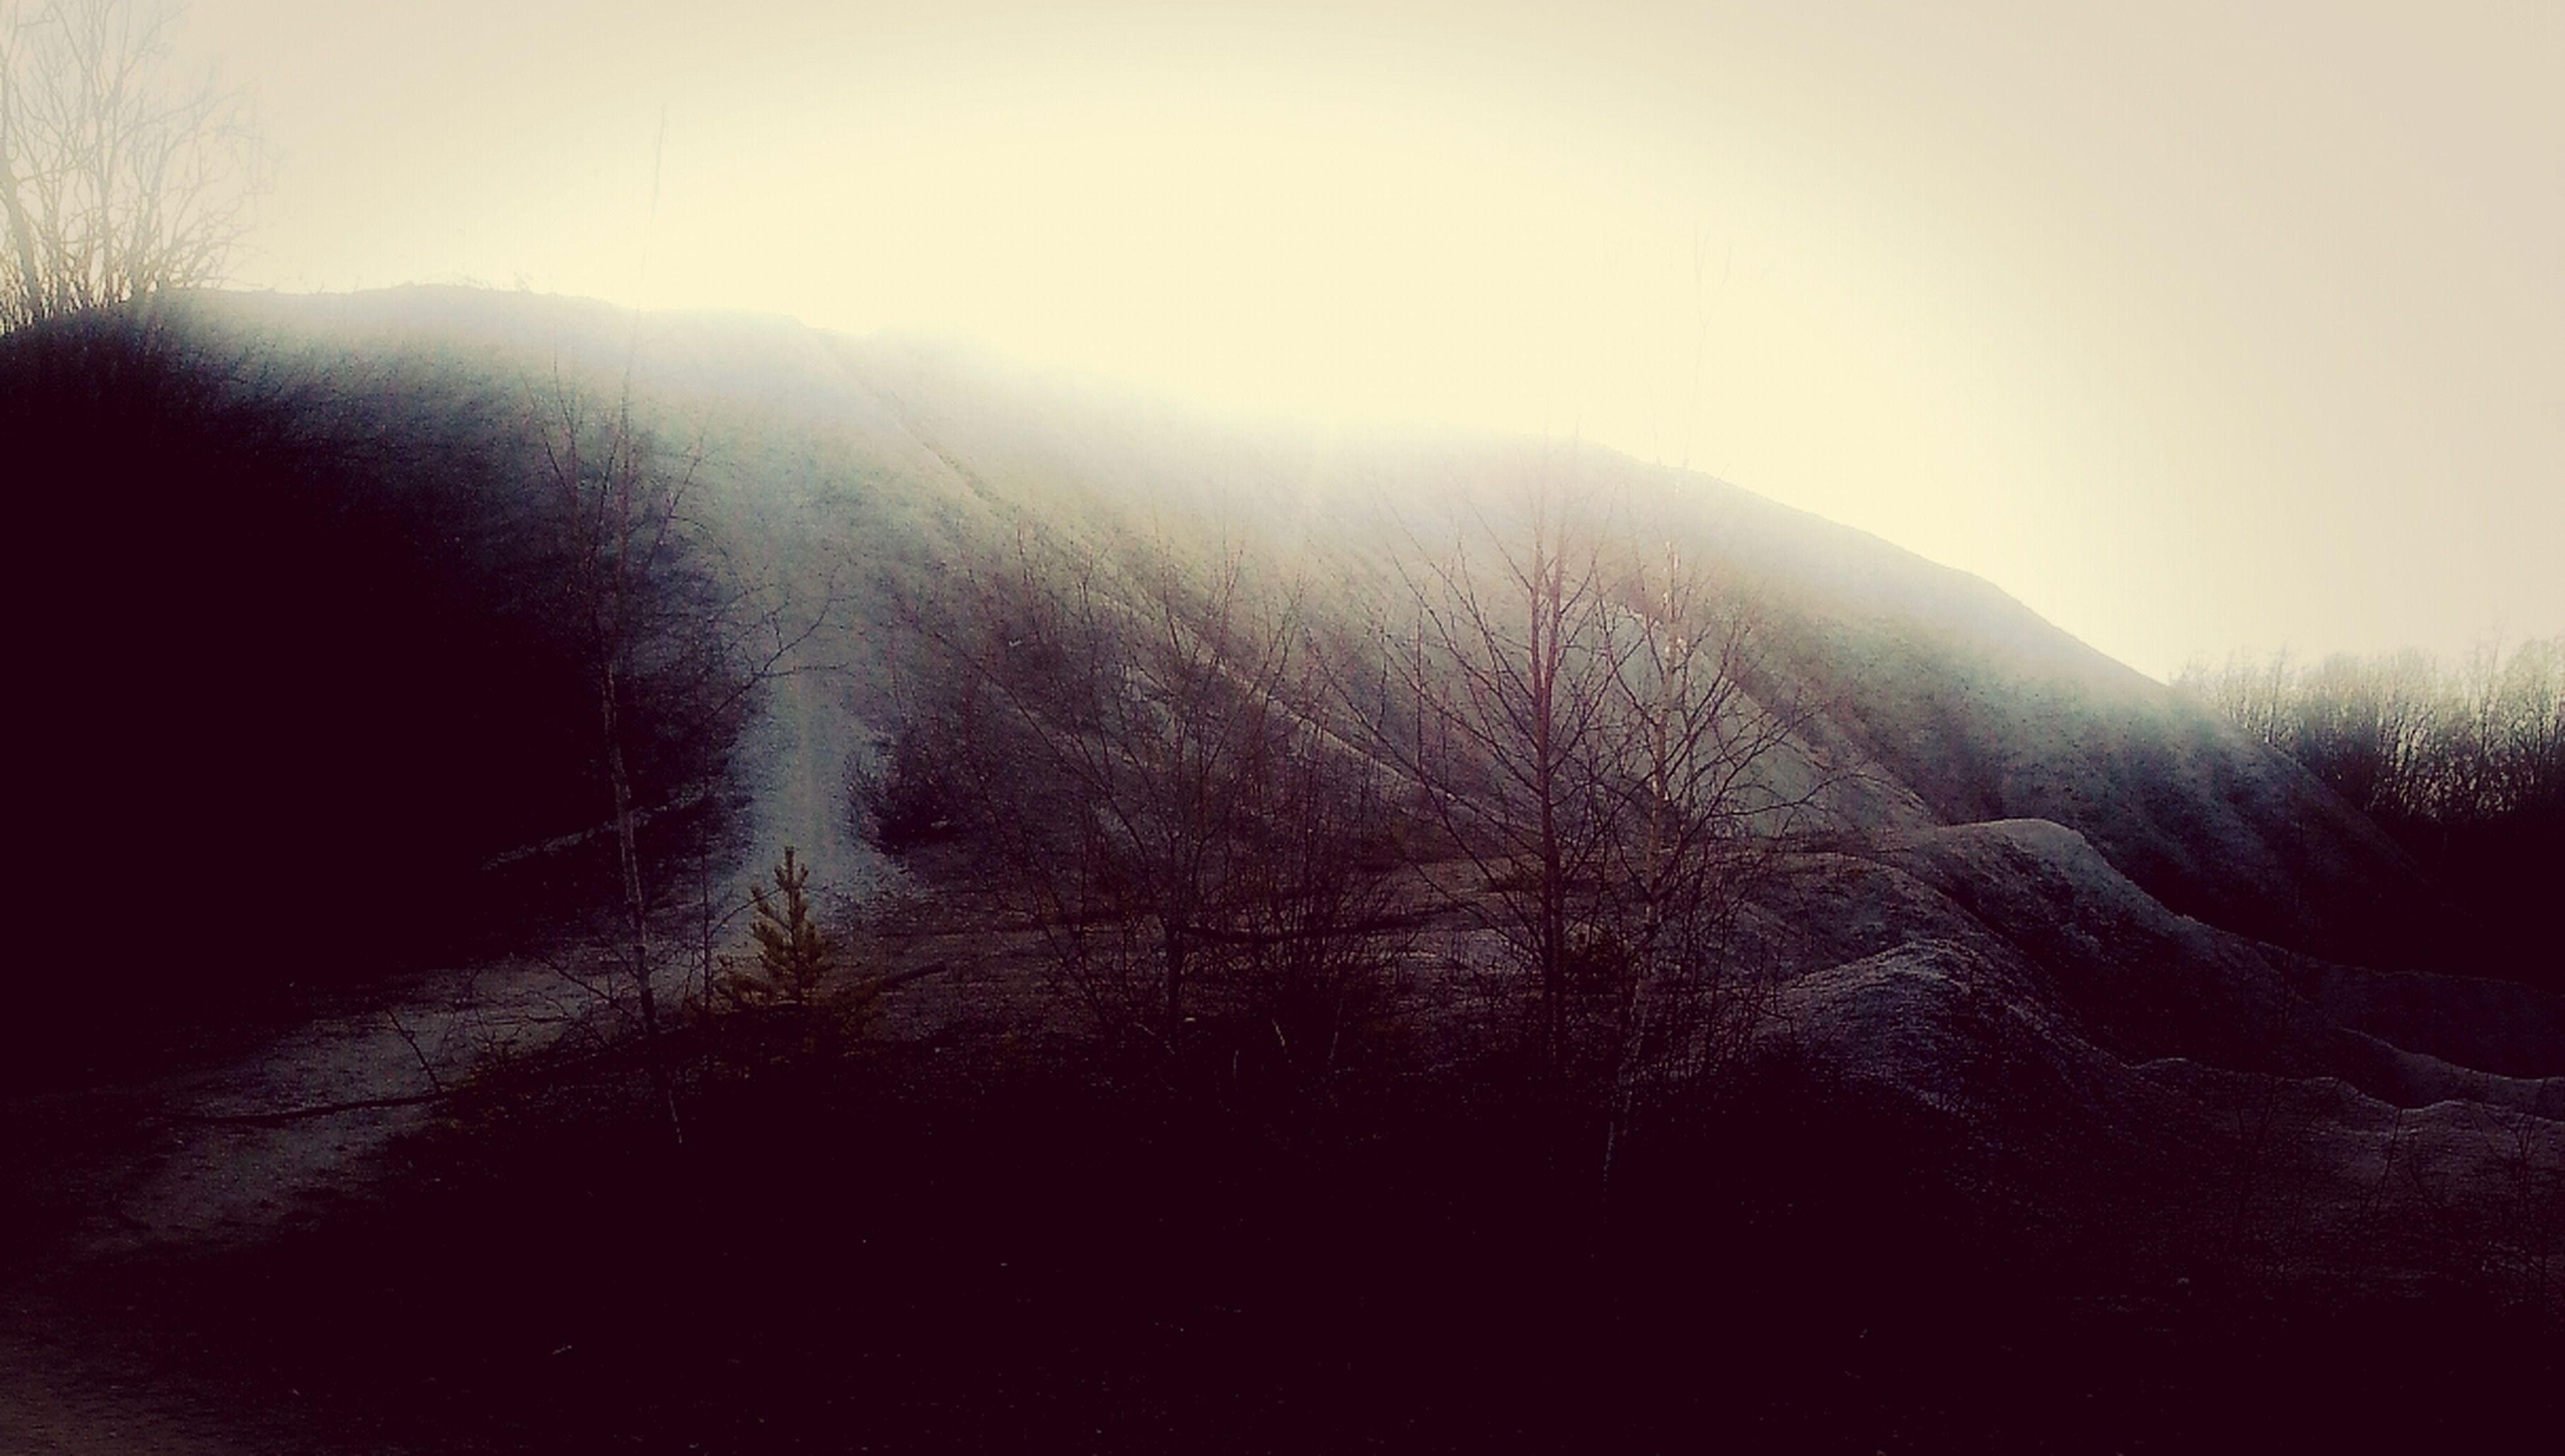 tranquility, clear sky, tranquil scene, sun, scenics, landscape, beauty in nature, nature, mountain, sunlight, sunbeam, copy space, tree, sky, non-urban scene, lens flare, silhouette, bare tree, field